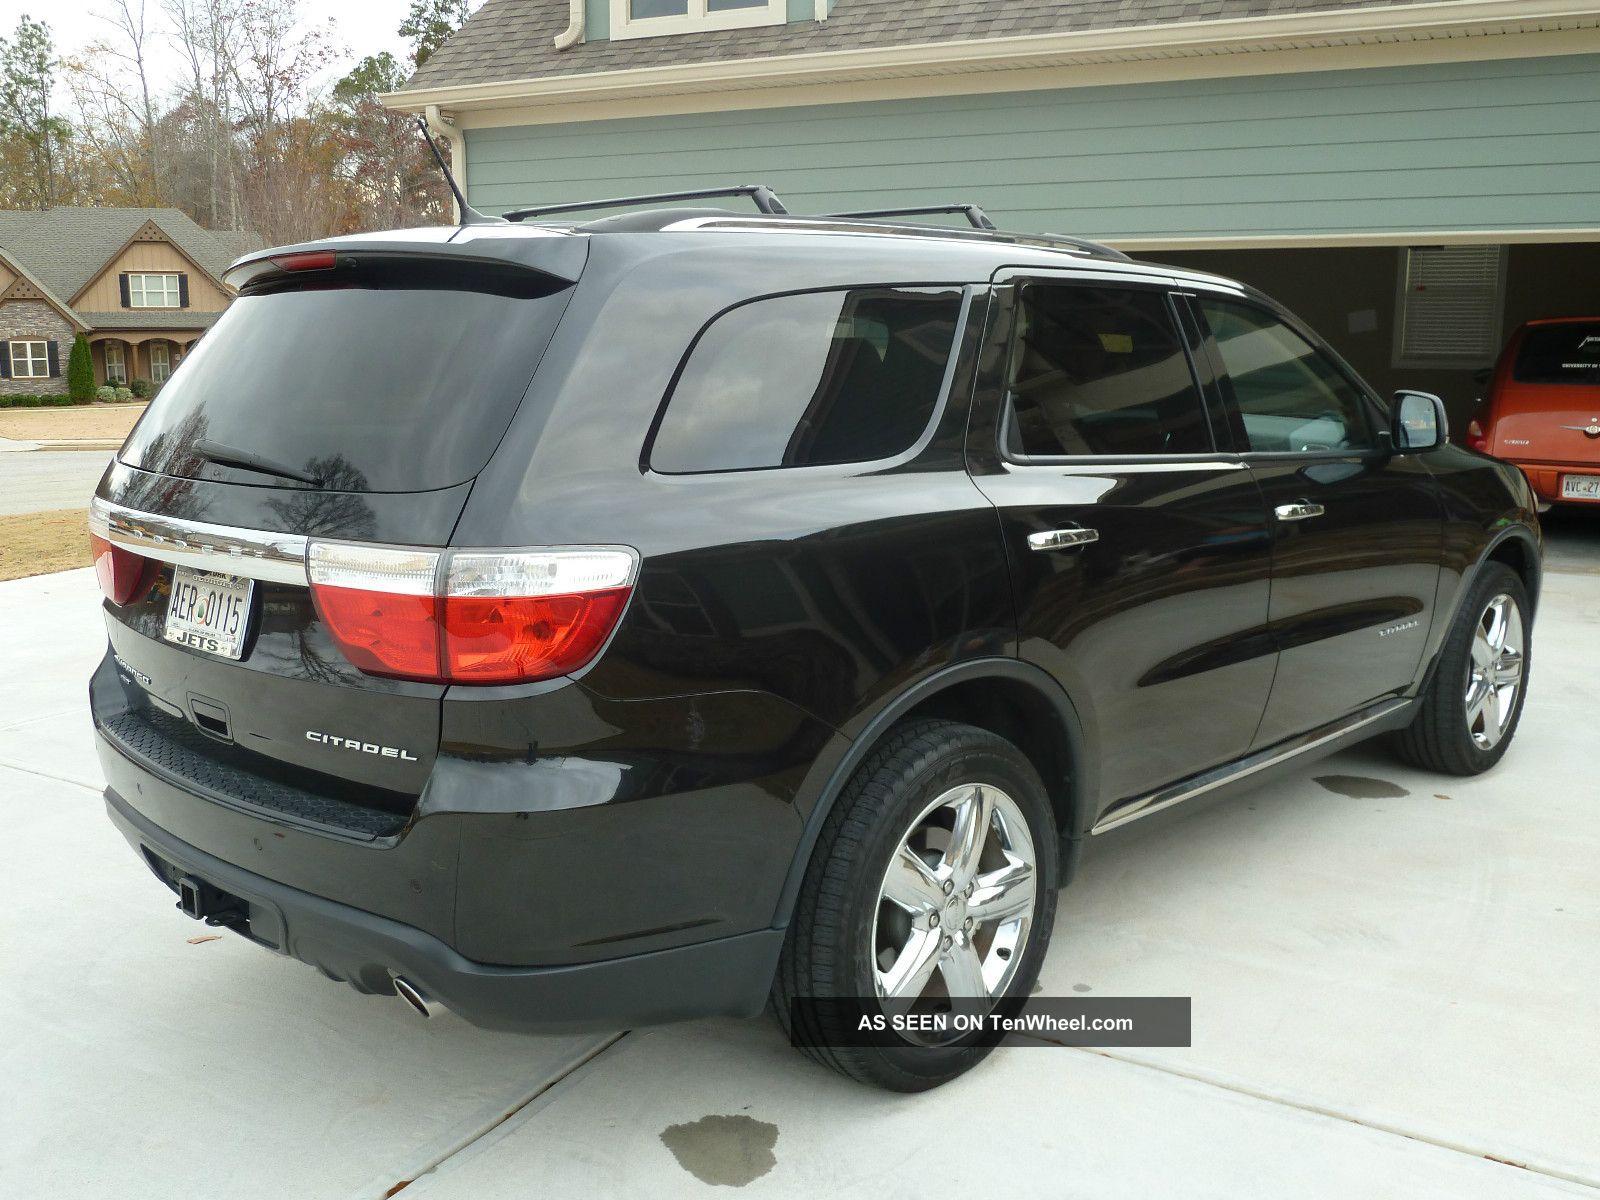 2011 Dodge Durango Citadel Awd 4wd V8 Hemi Black W Black